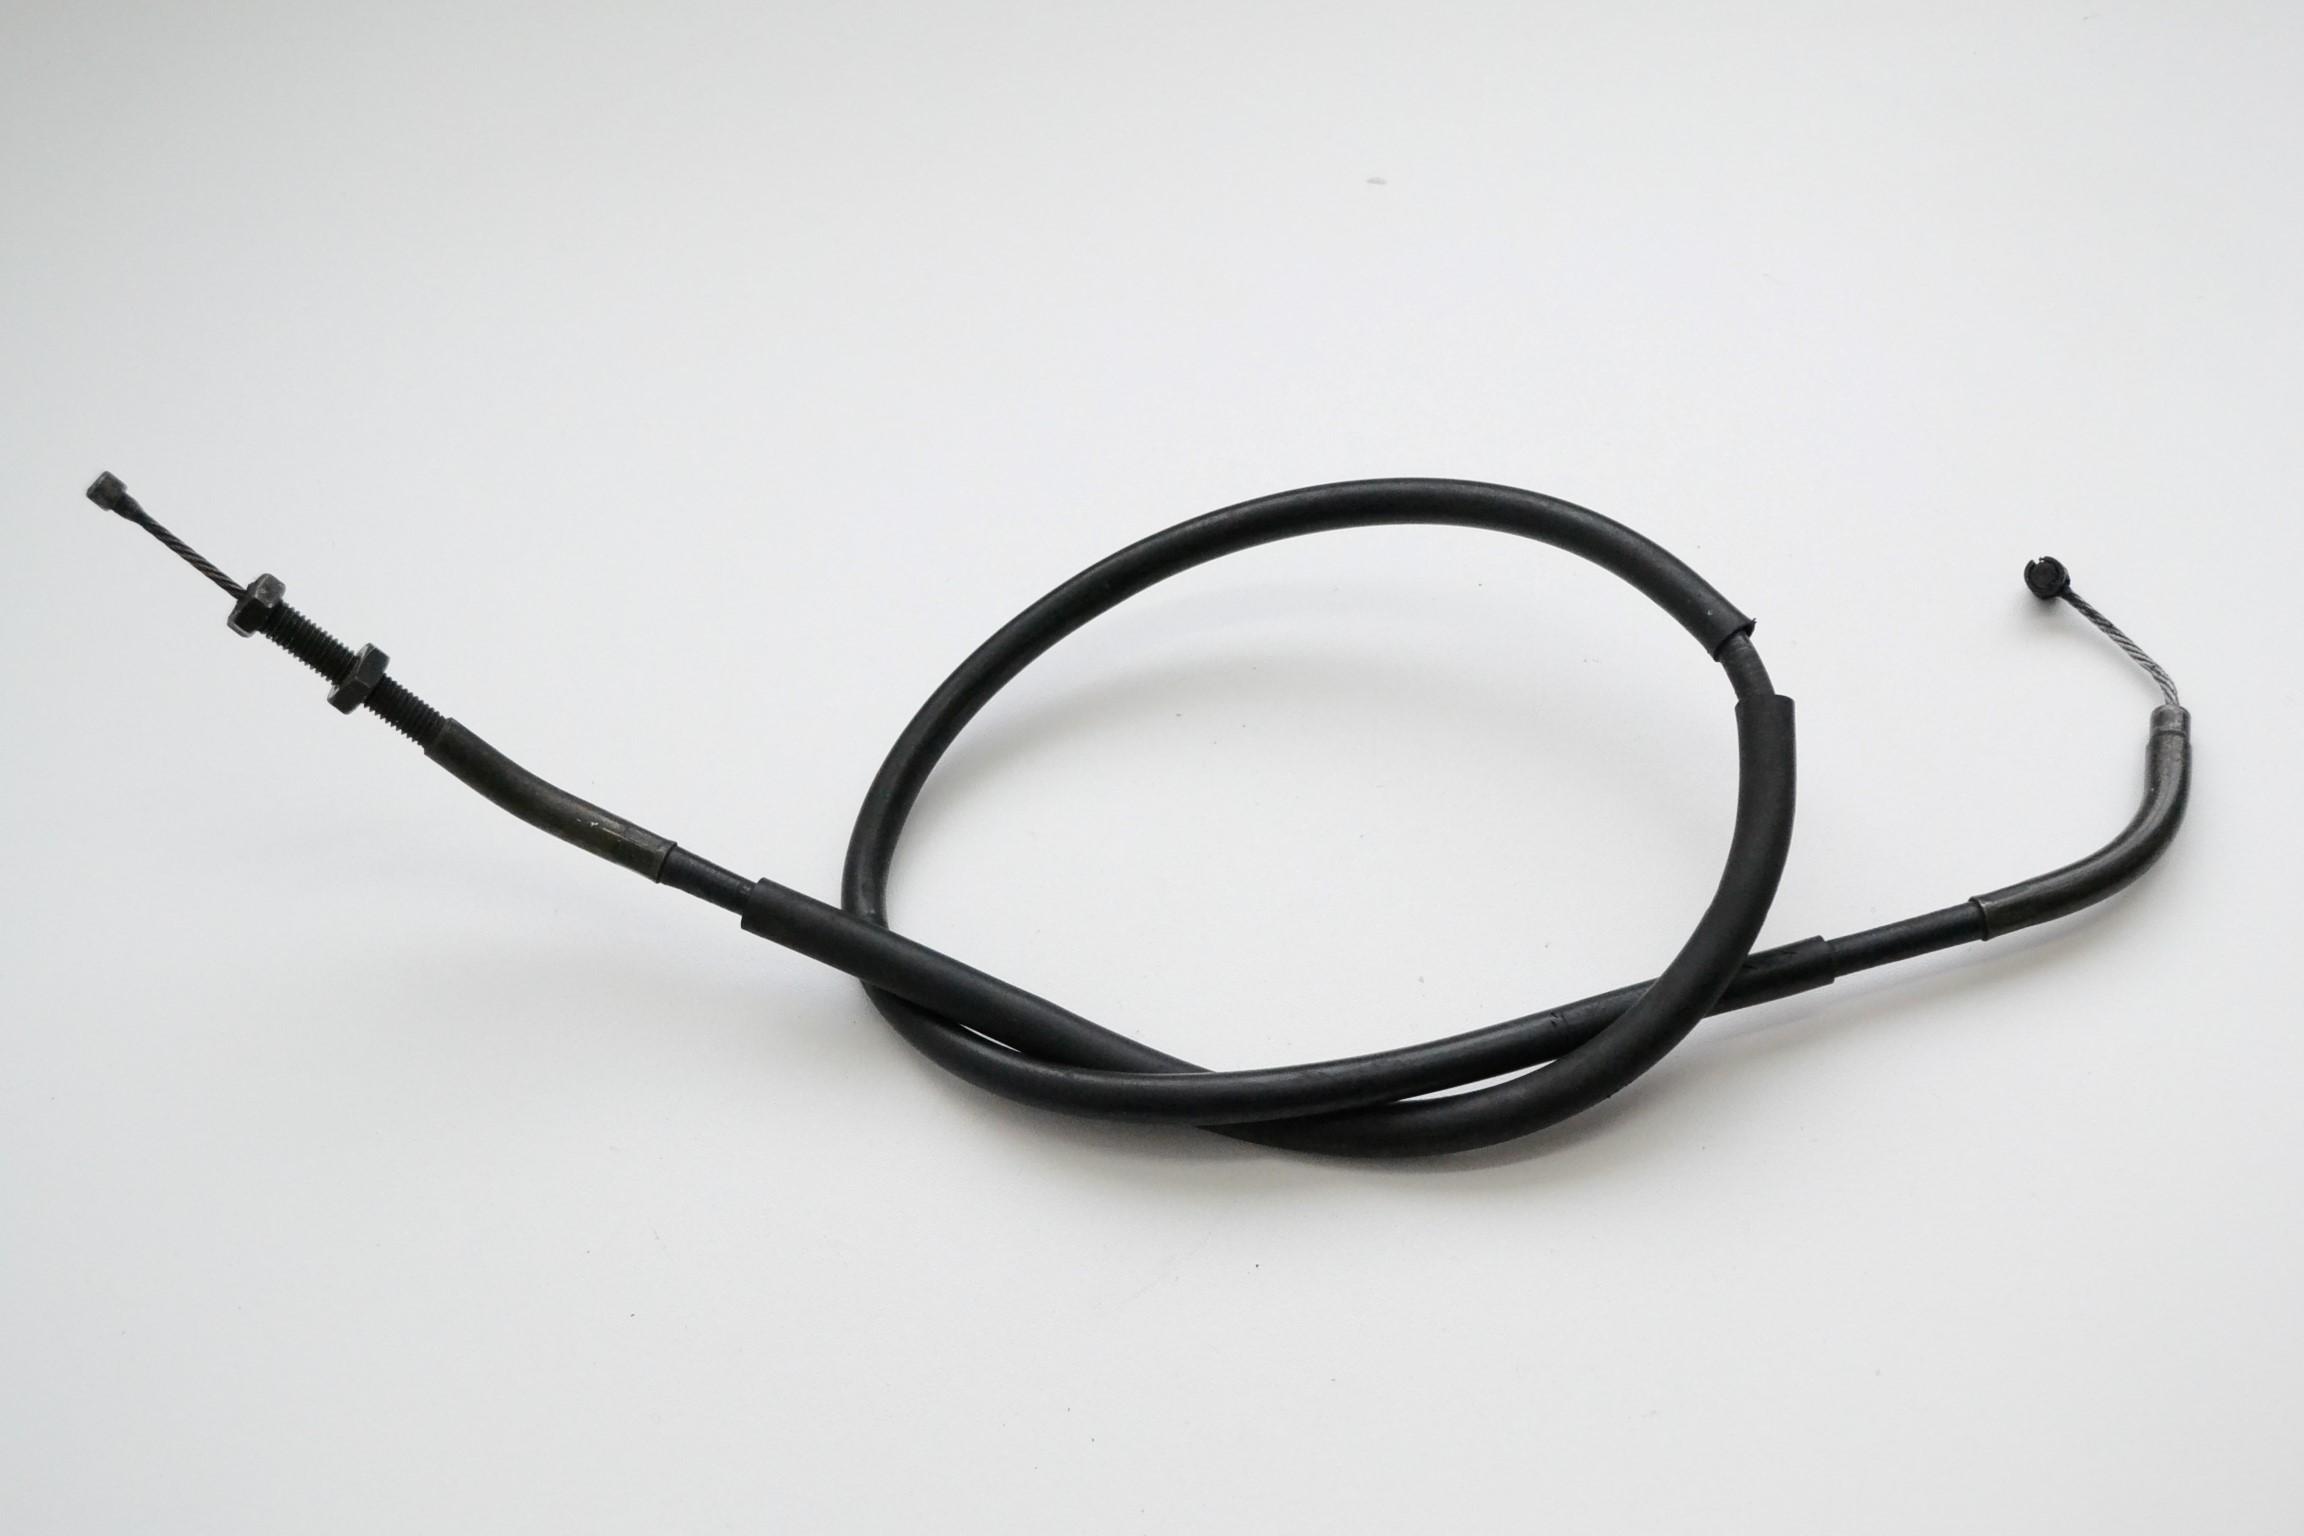 Honda CB600 Hornet 98 to 04 Speedo Cable